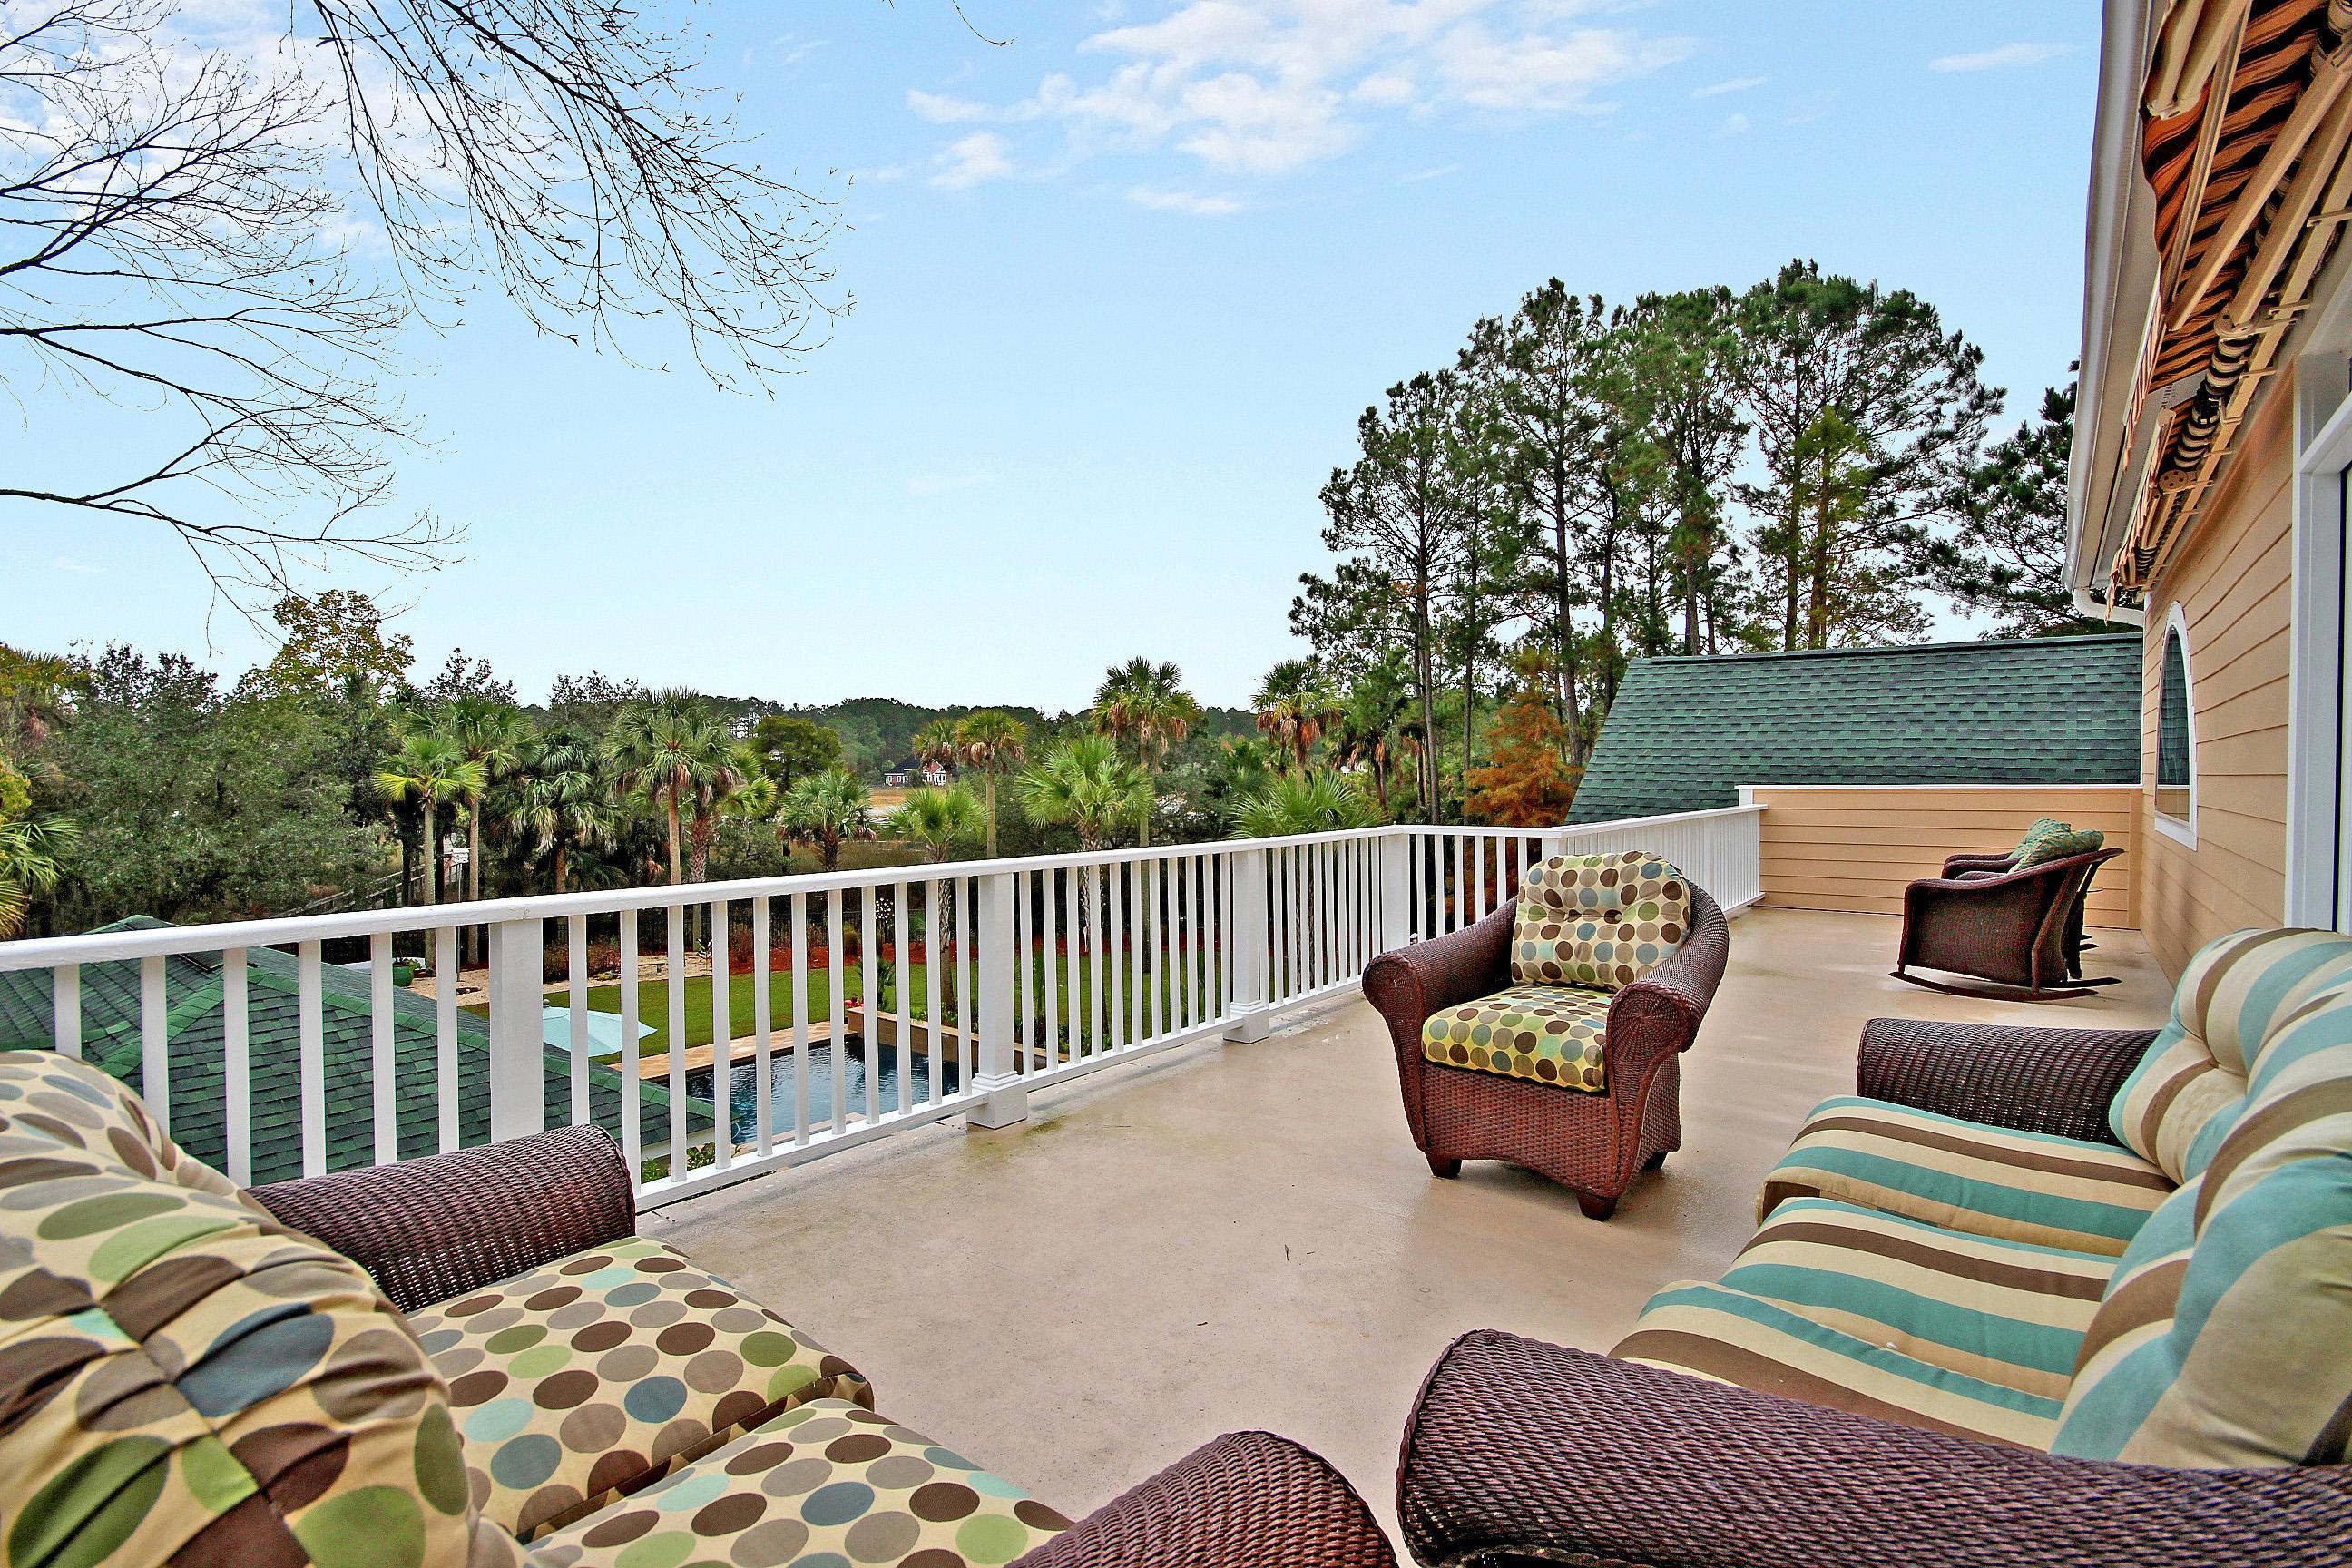 Dunes West Homes For Sale - 2364 Darts Cove, Mount Pleasant, SC - 26